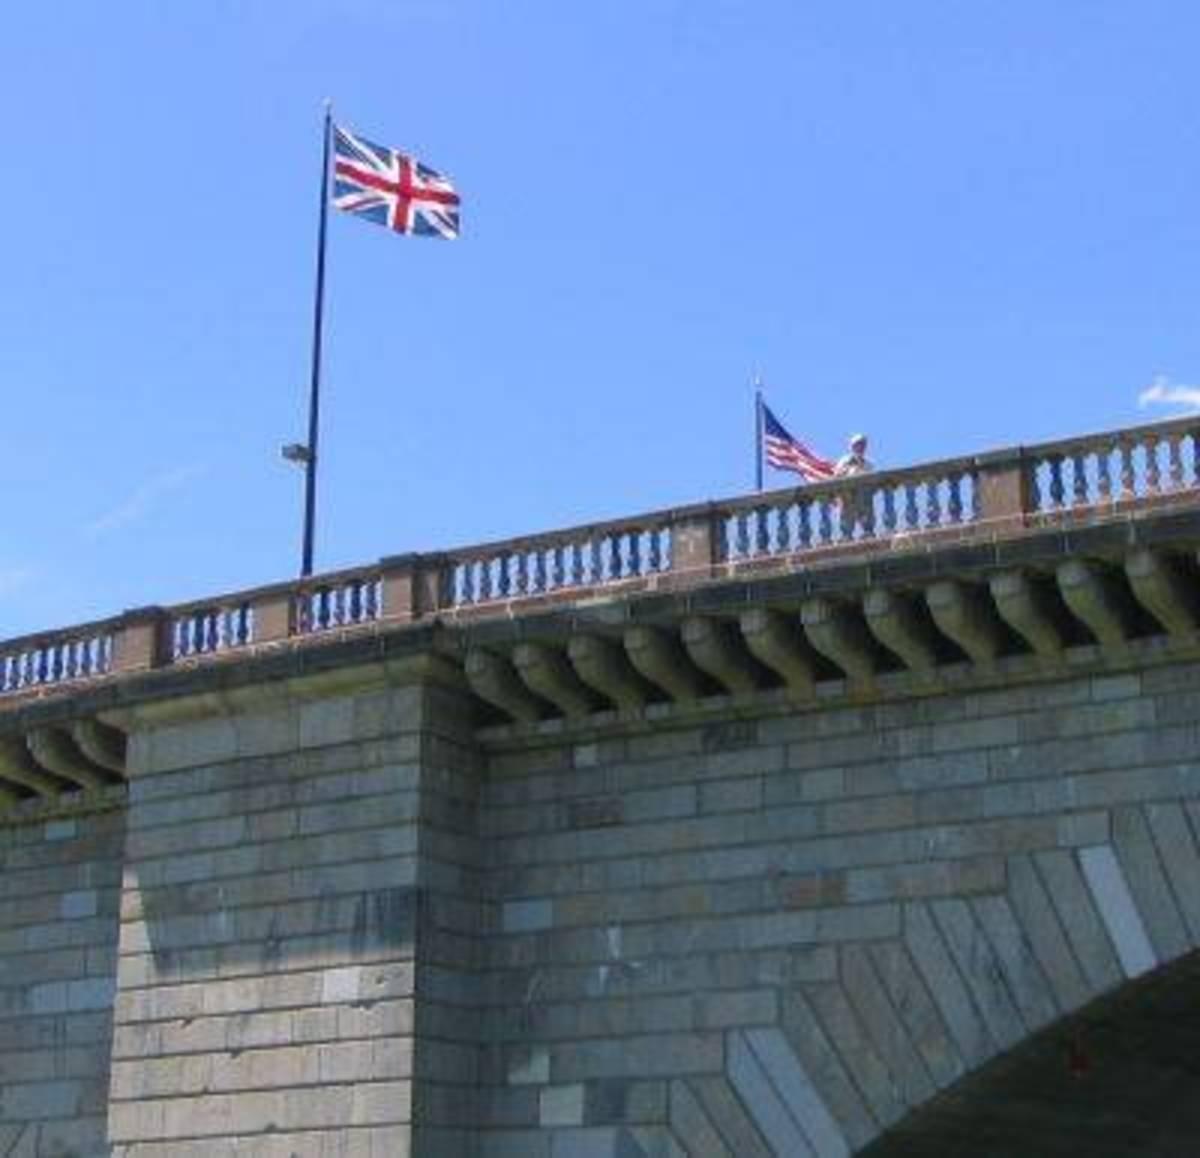 London Bridge located in Lake Havasu, Arizona (yes, it is THE London Bridge from the song!)